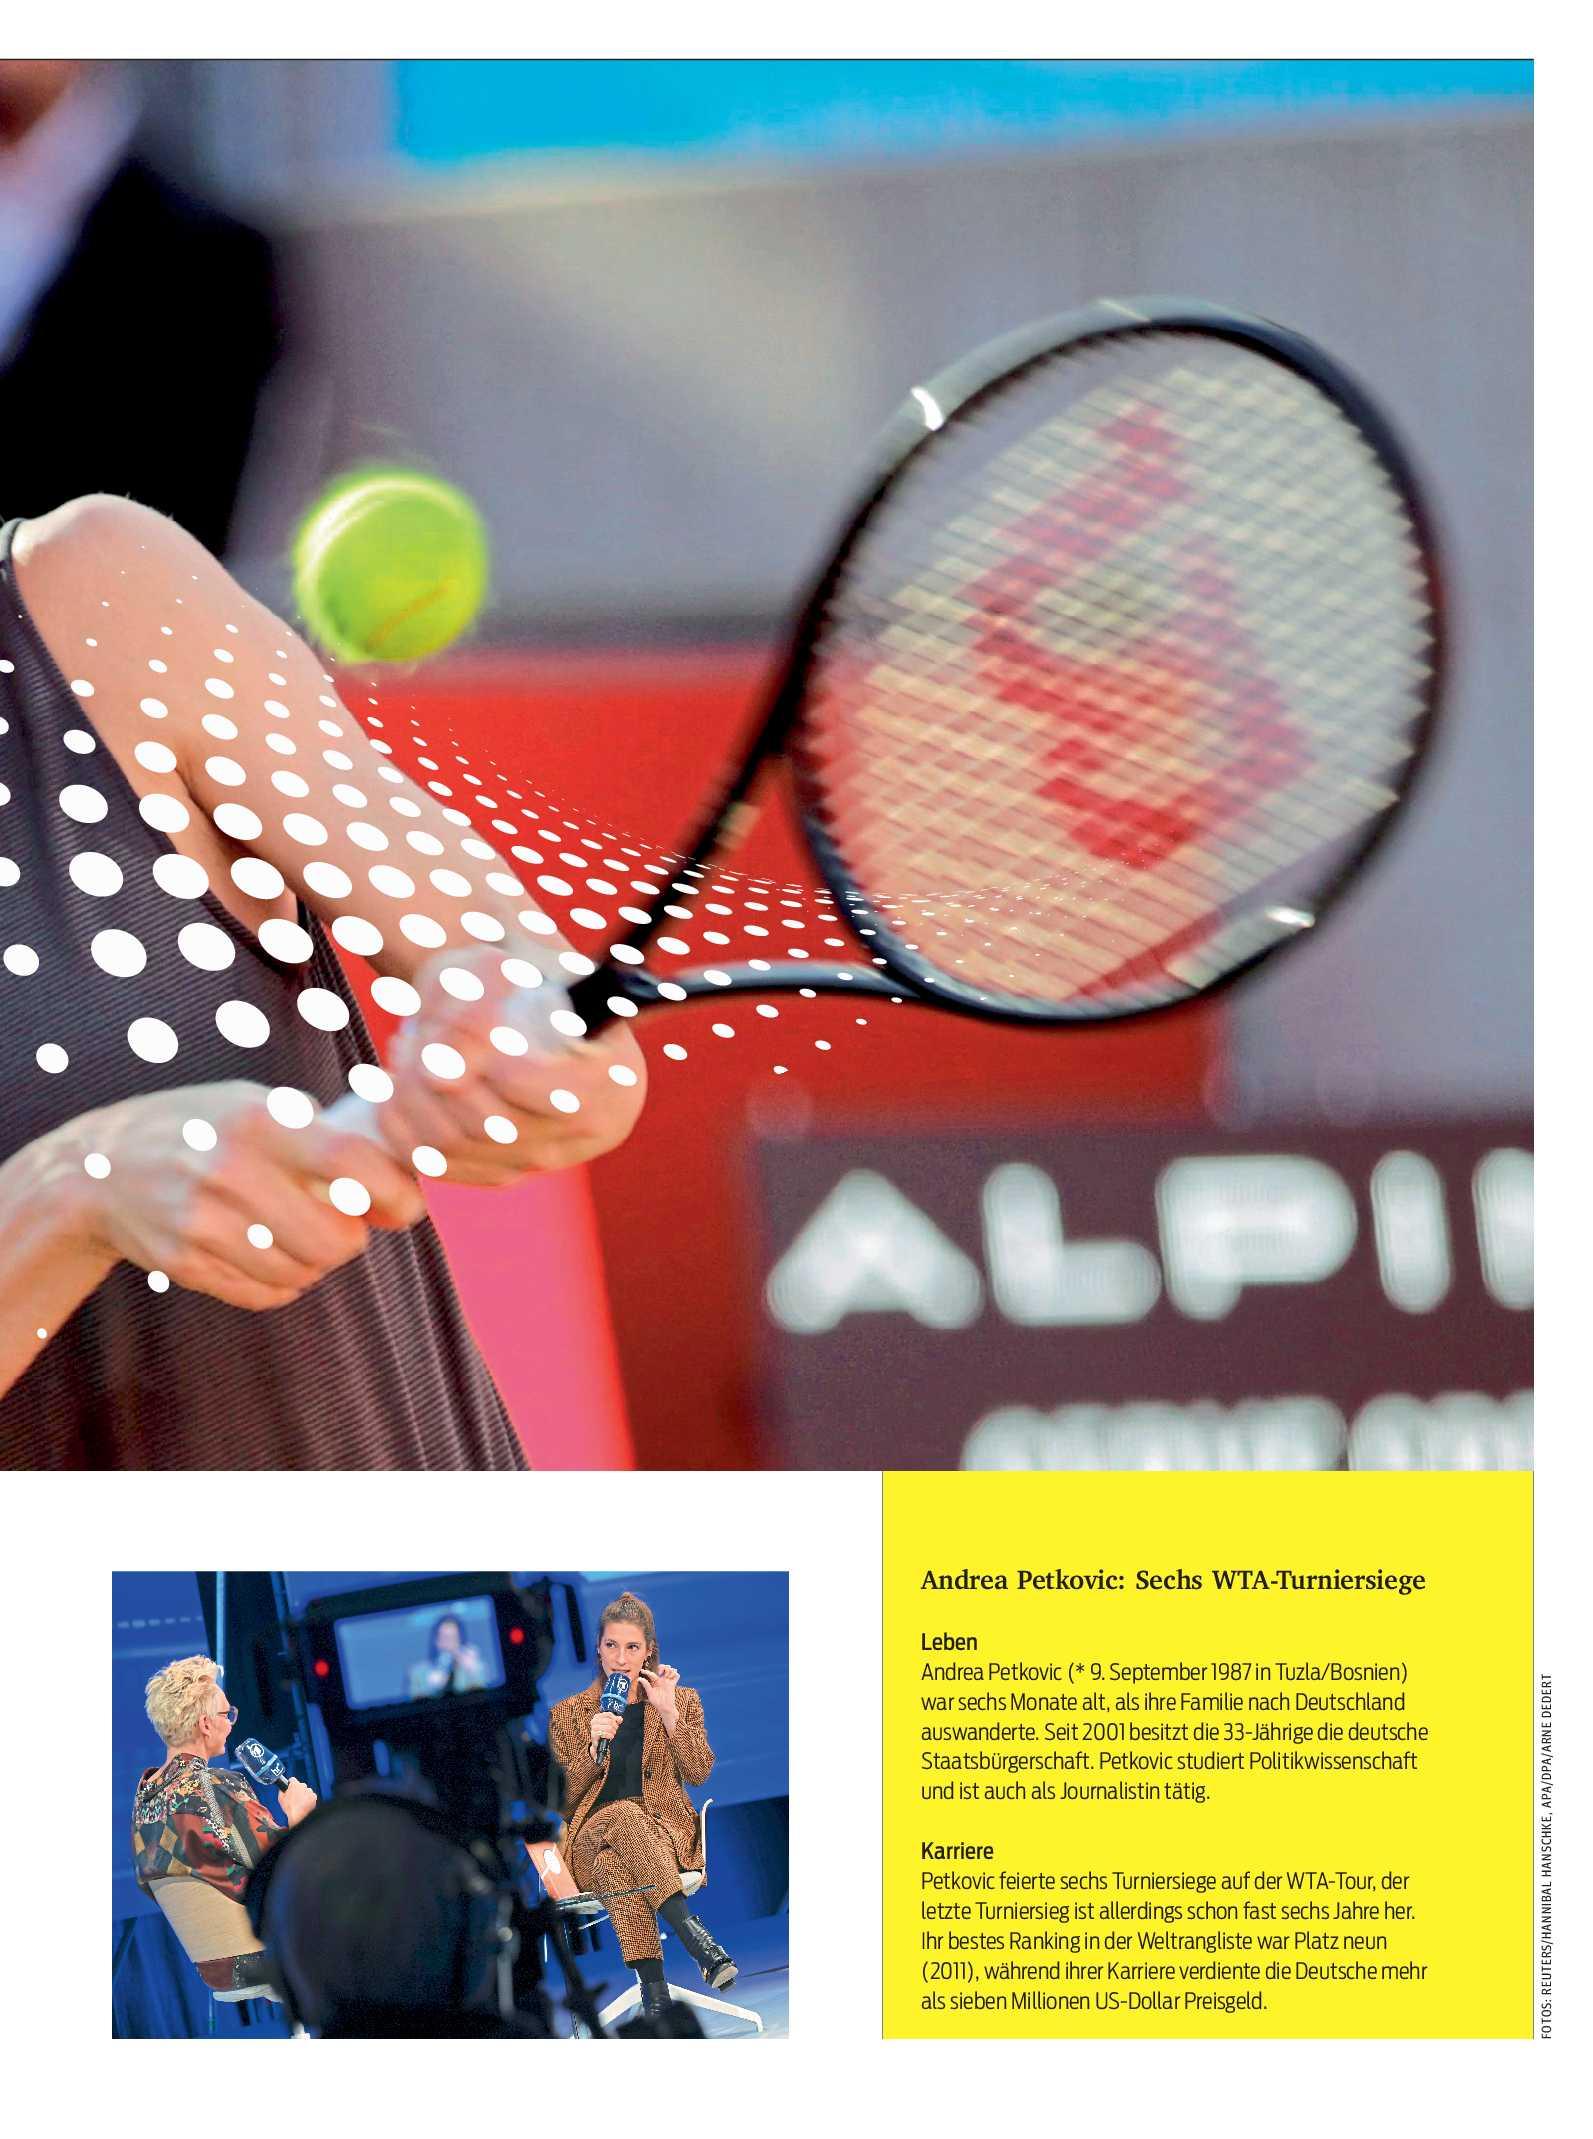 public/epaper/imported/20201209/kurier/magazin/magazin_20201209_053.jpg